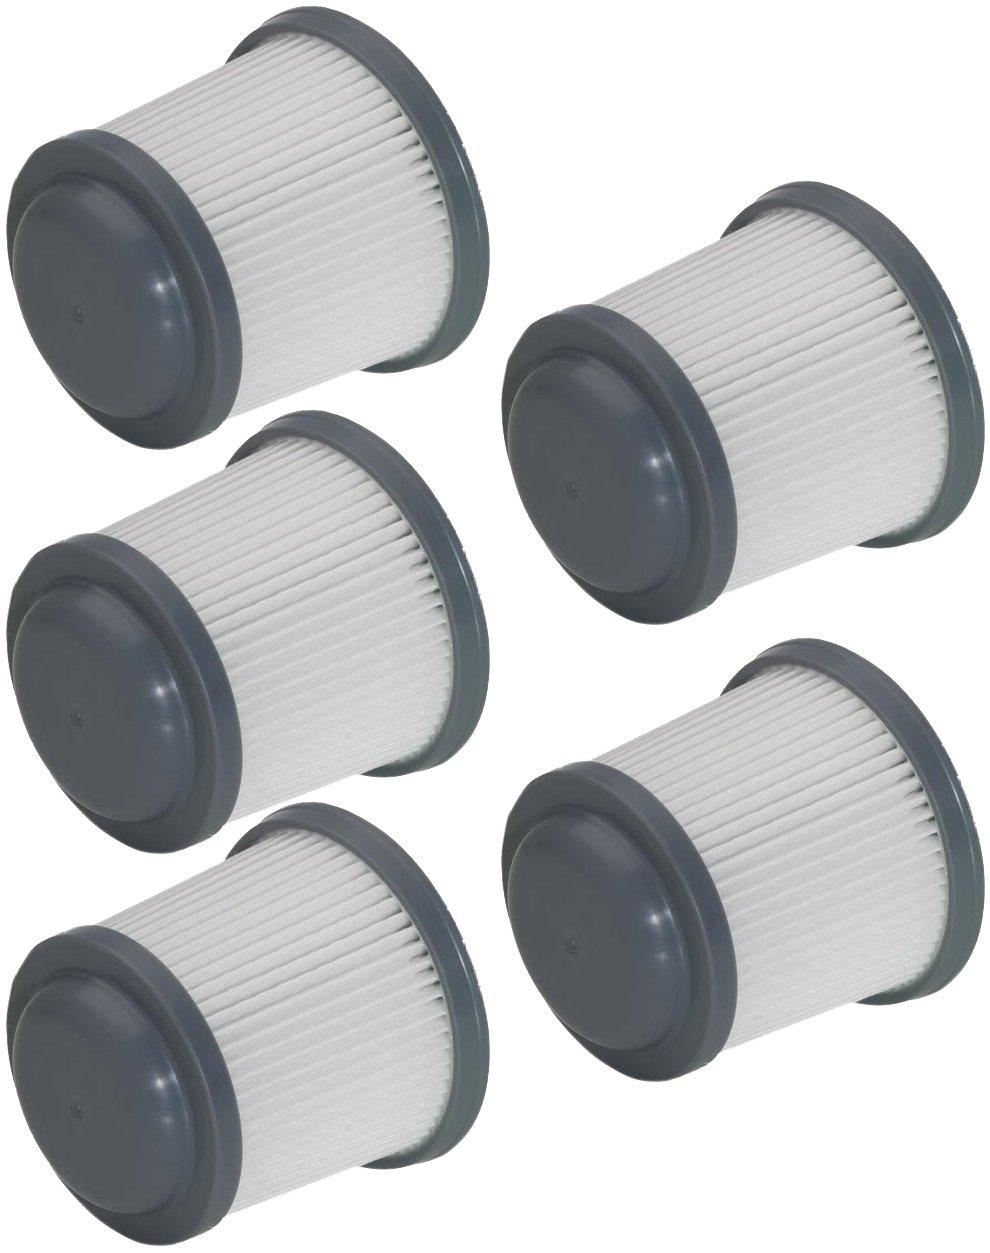 Black & Decker PHV1810/PHV1210 Pivot Vac PV110 Filter 5 Pack # 90552433-01-5pk